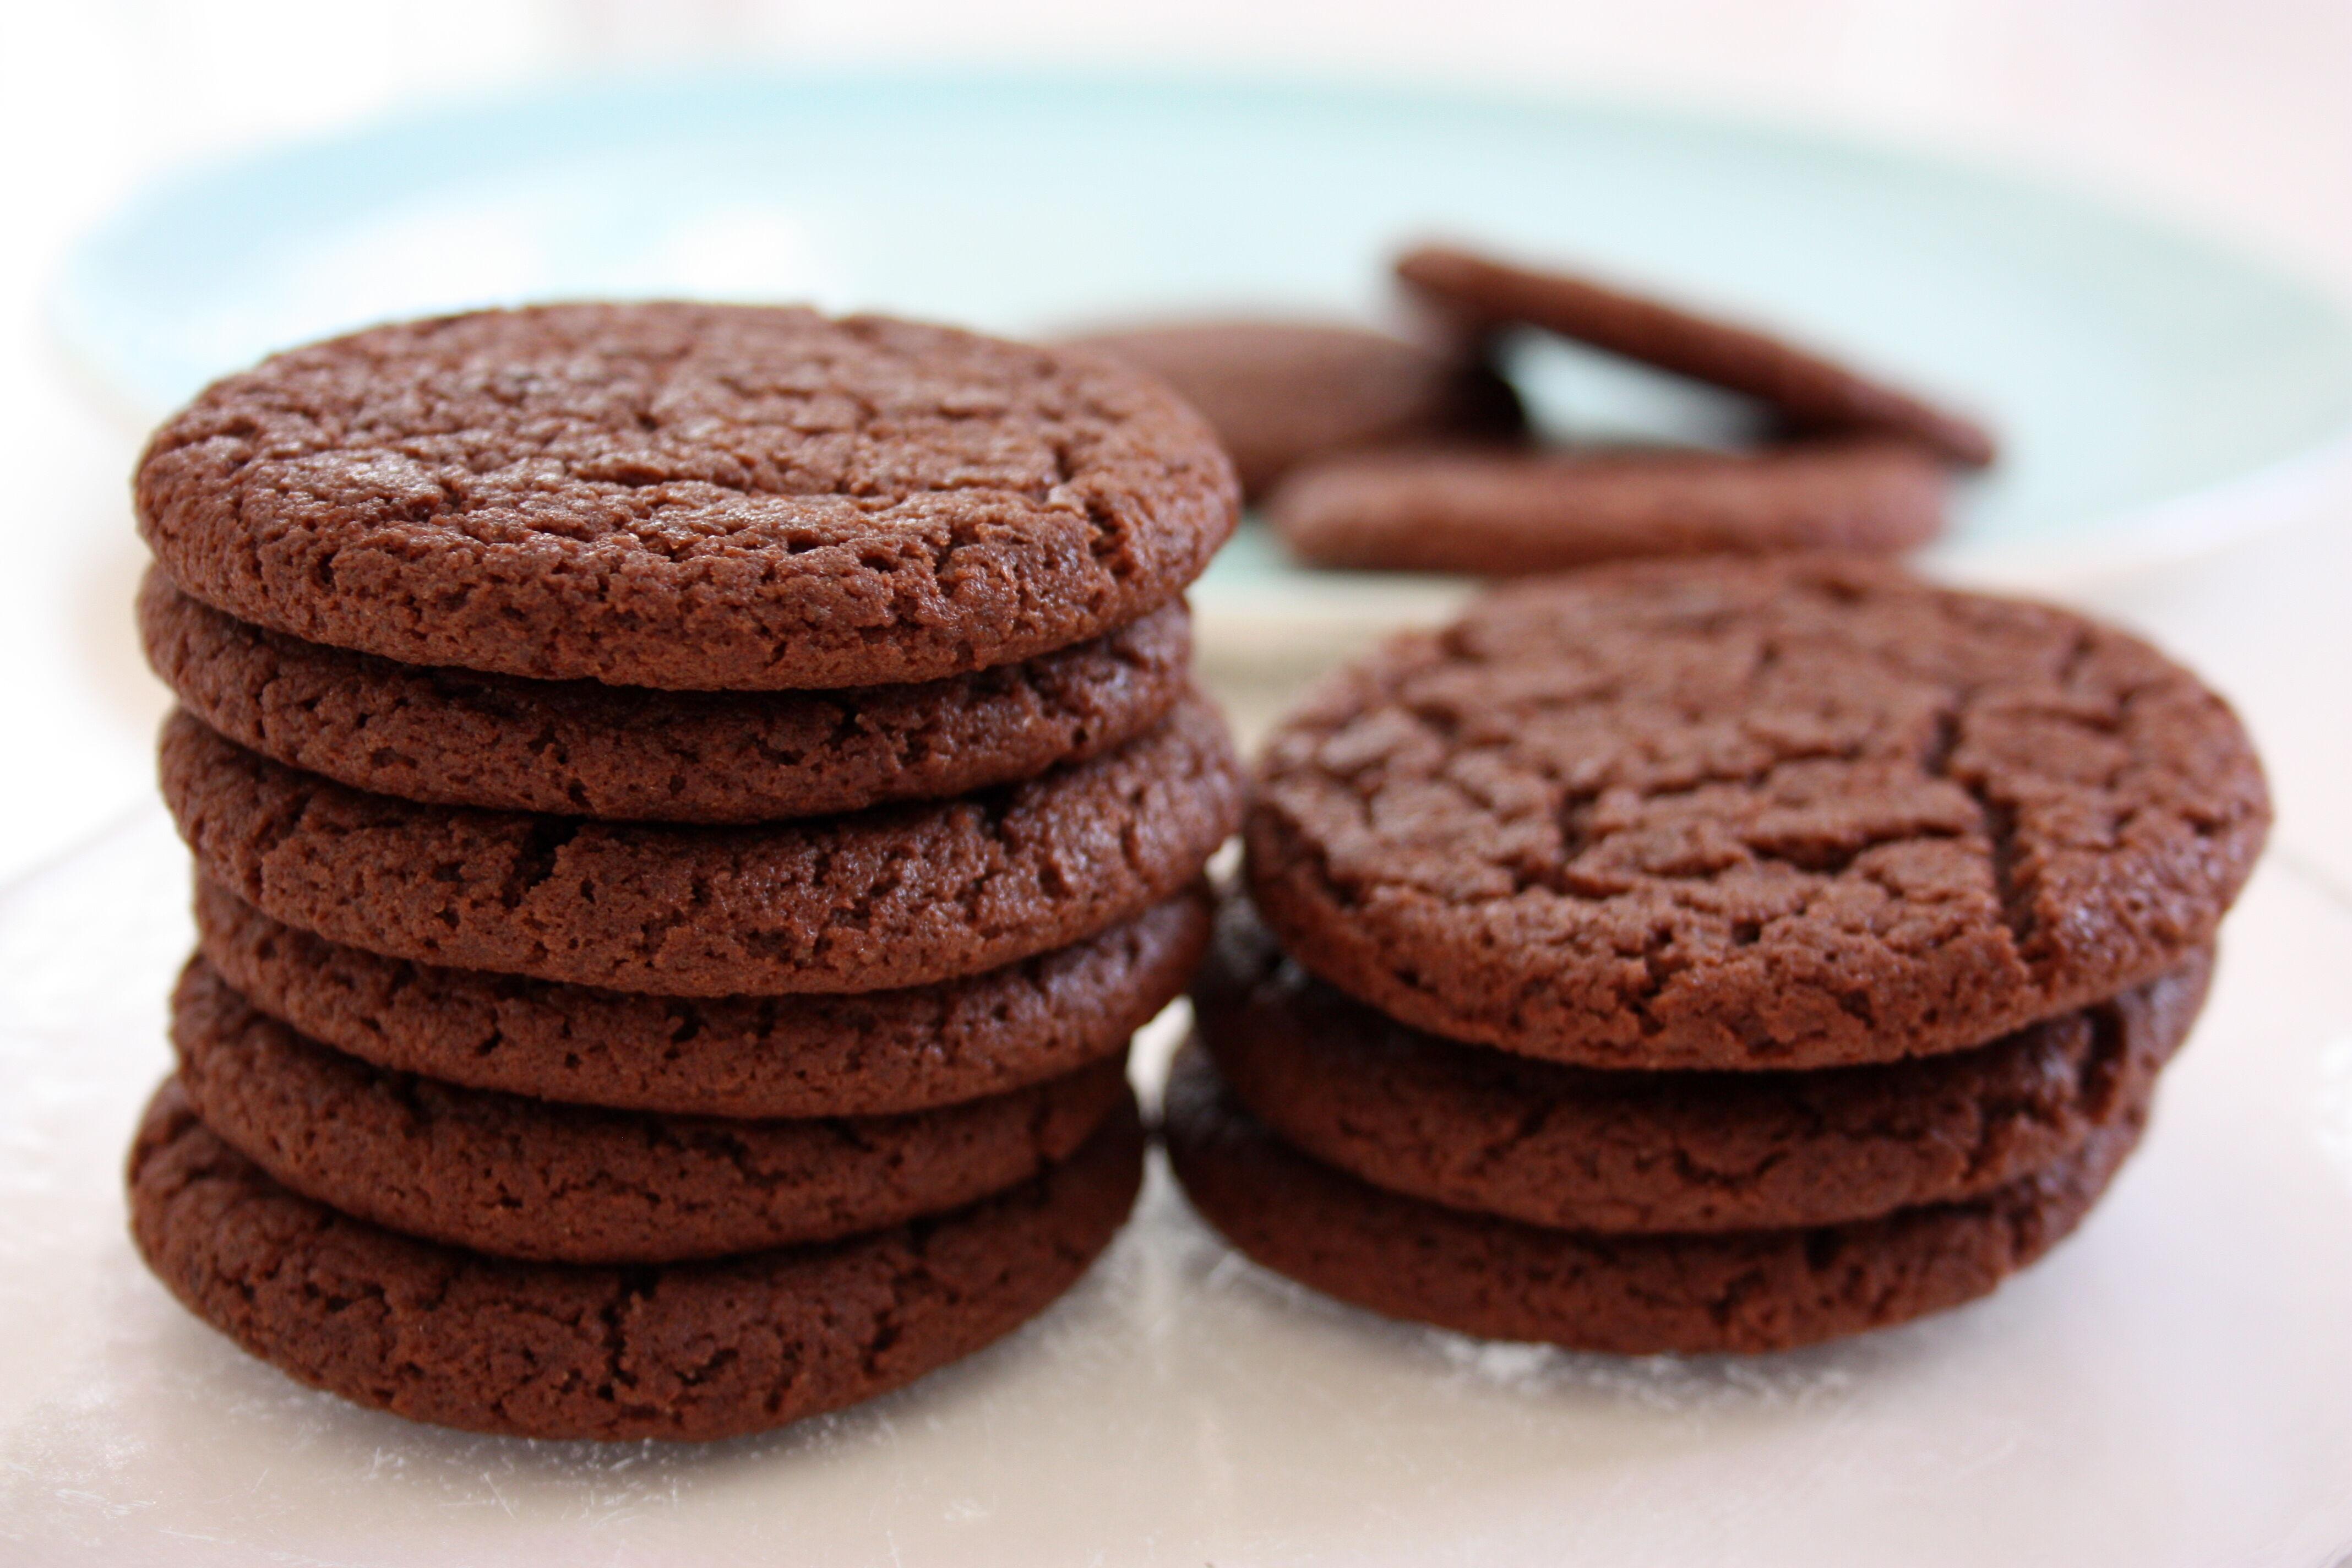 enkla kakor med choklad